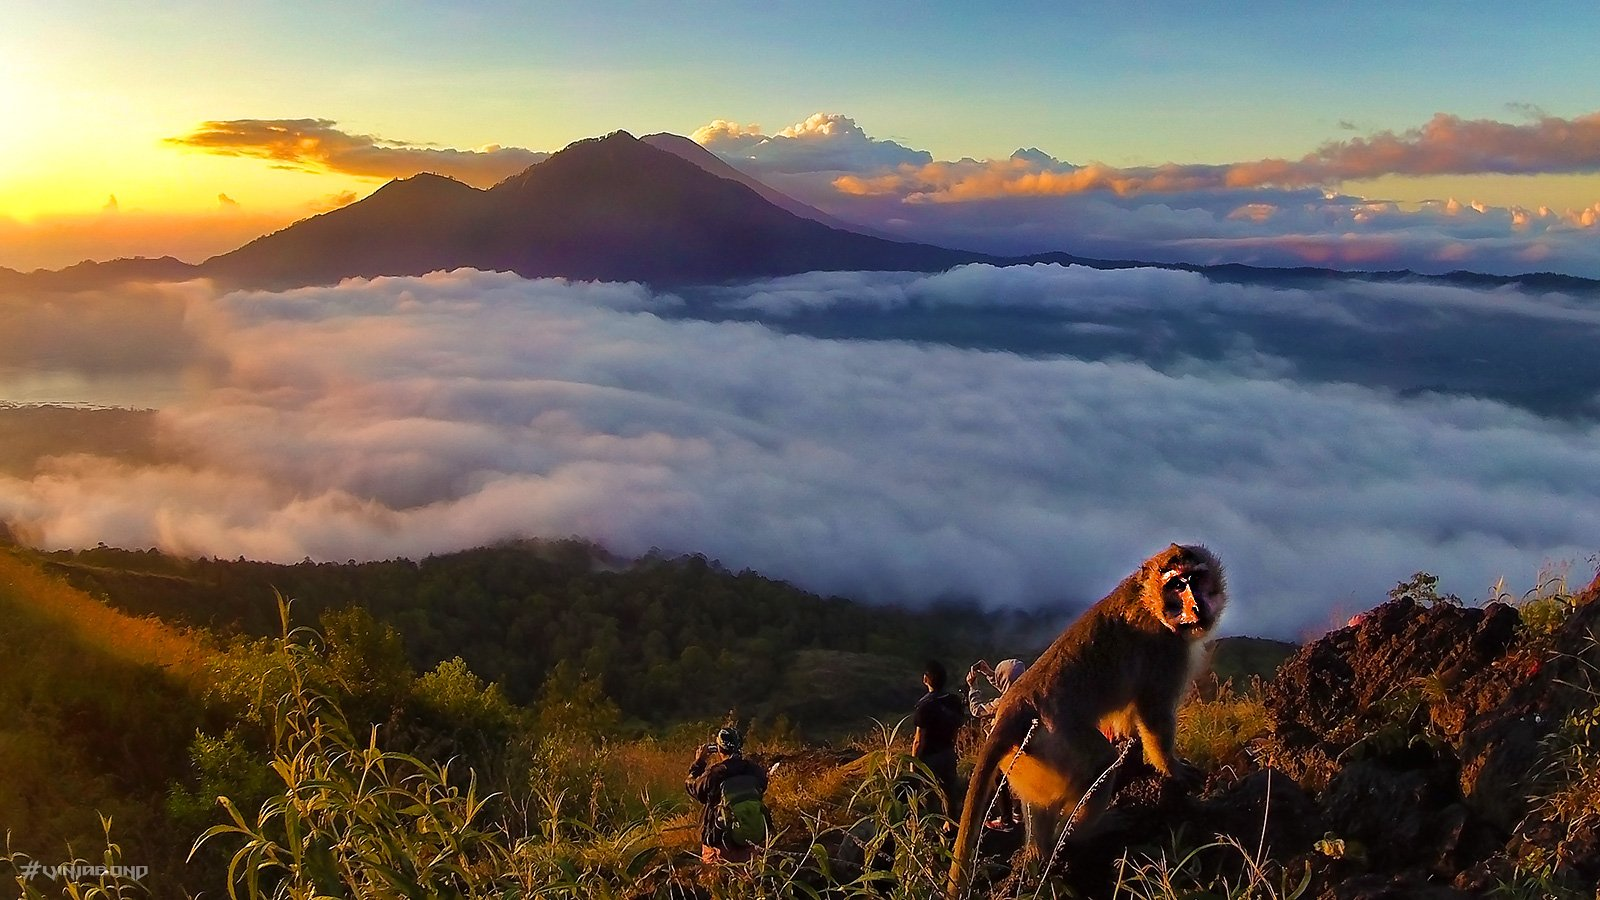 Curious Monkey on Mount Batur /// Vinjabond